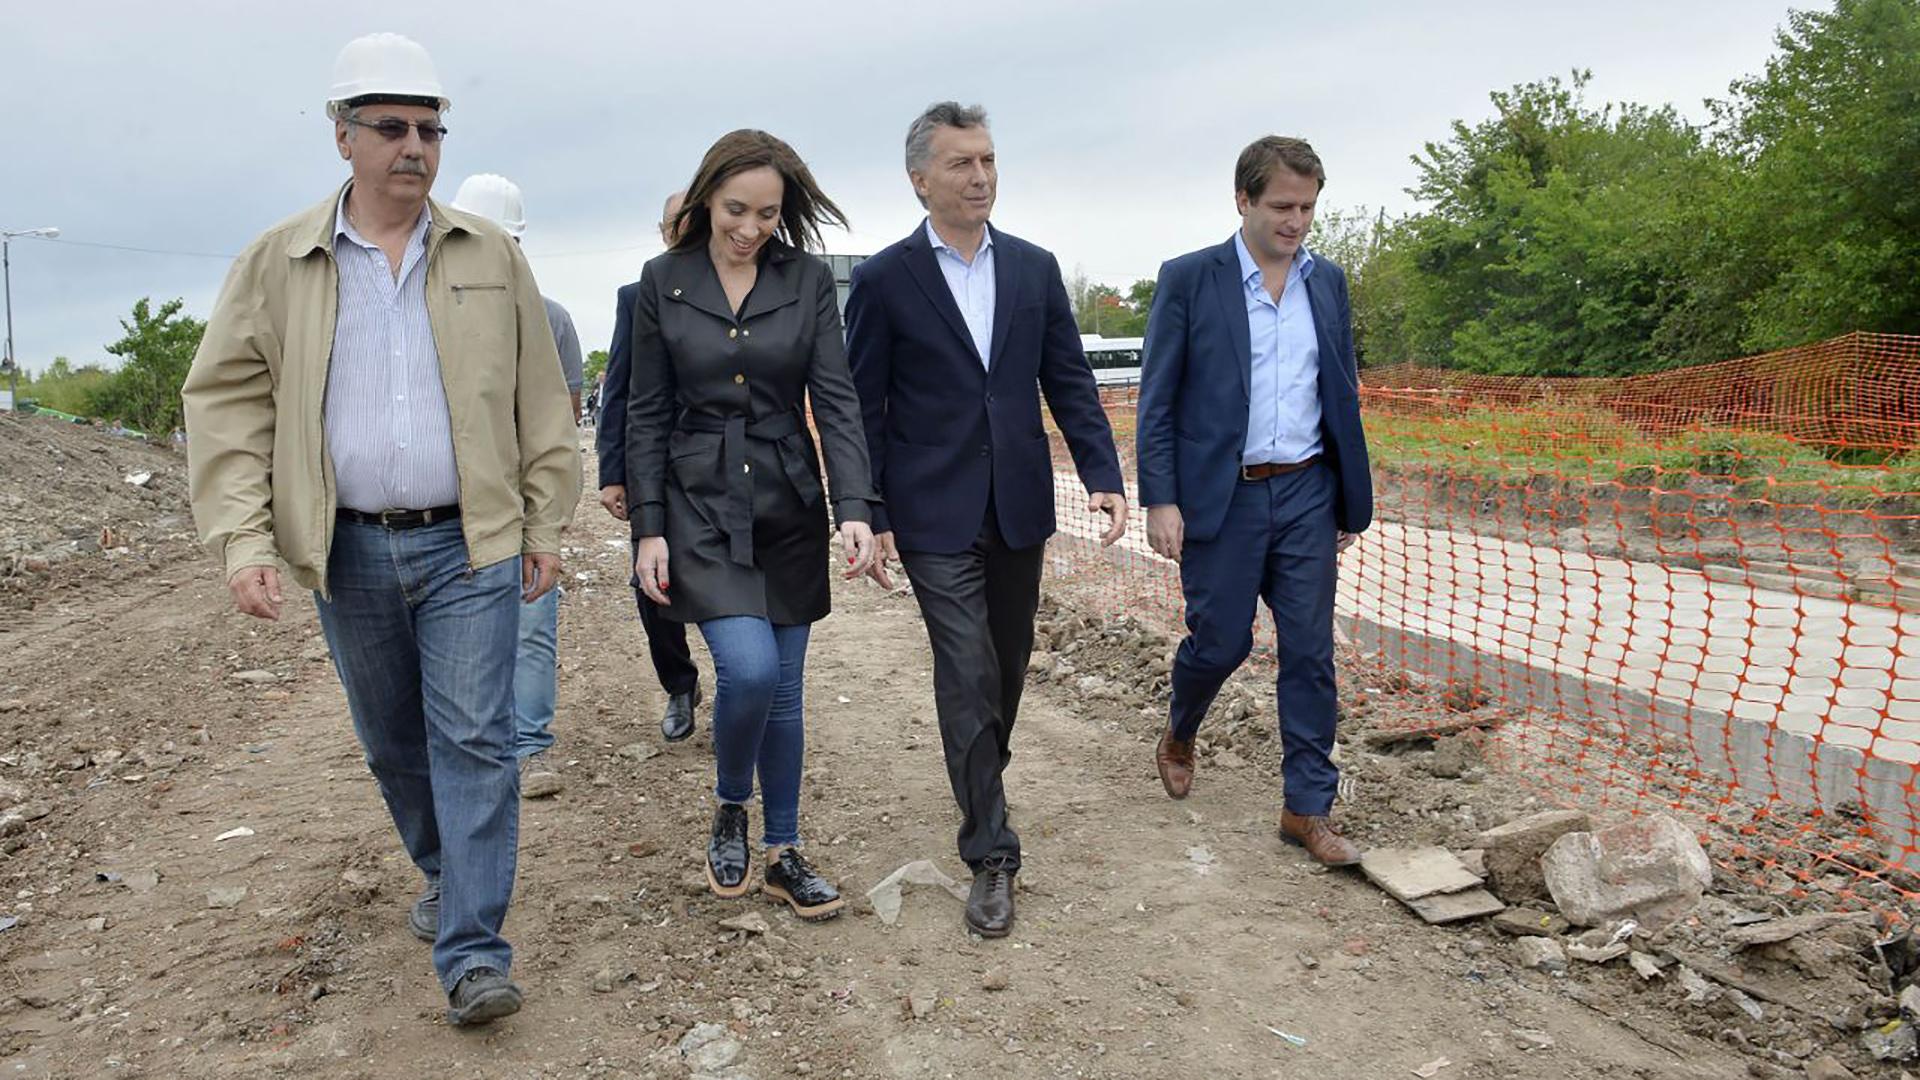 María Eugenia Vidal volverá a mostrarse con Mauricio Macri